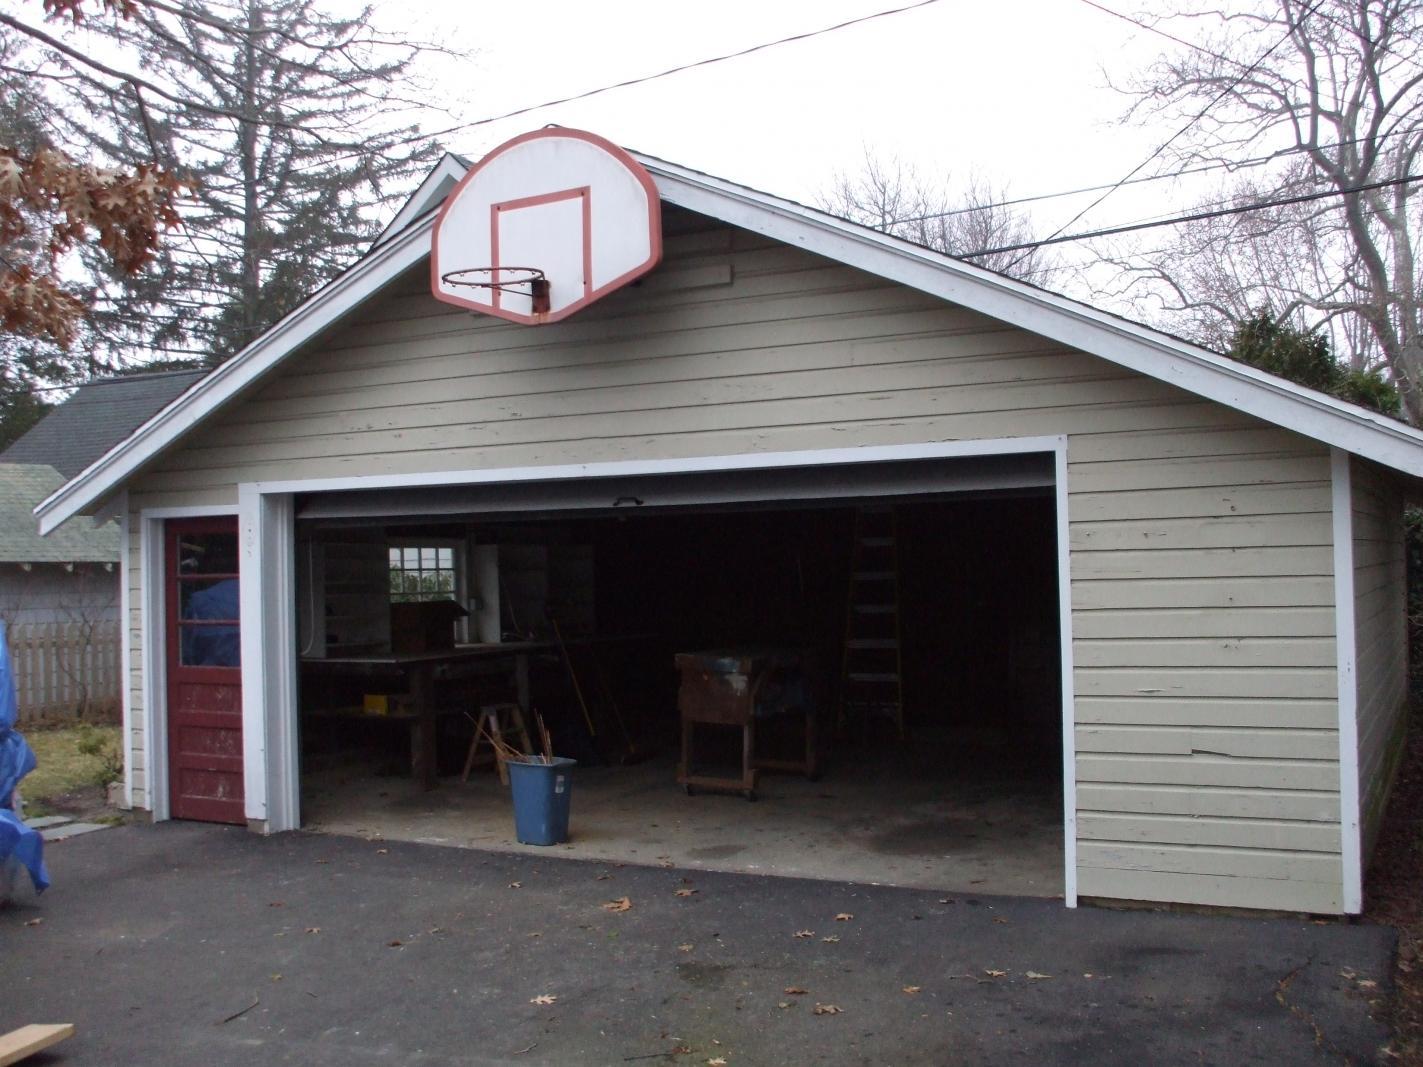 Garage - Rafters Upgrade-peter-sykes-day-1-001.jpg